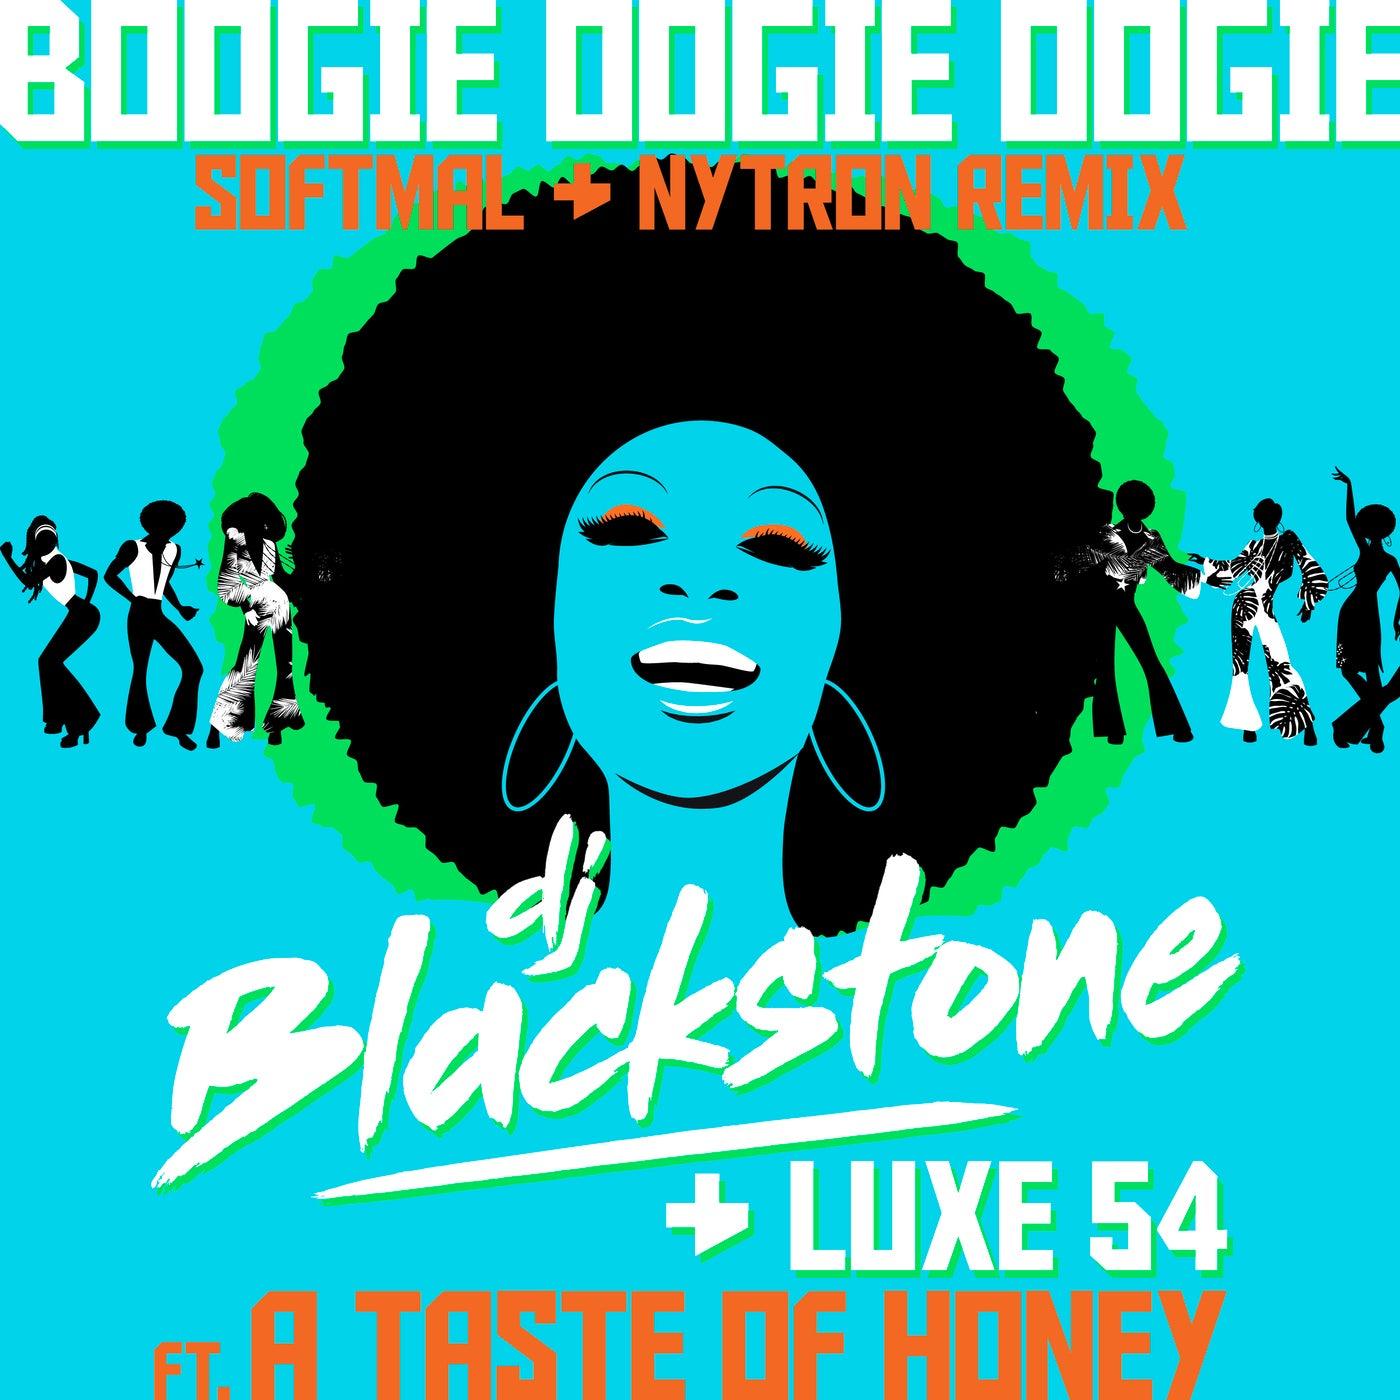 Boogie Oogie Oogie (Softmal & Nytron Remix)